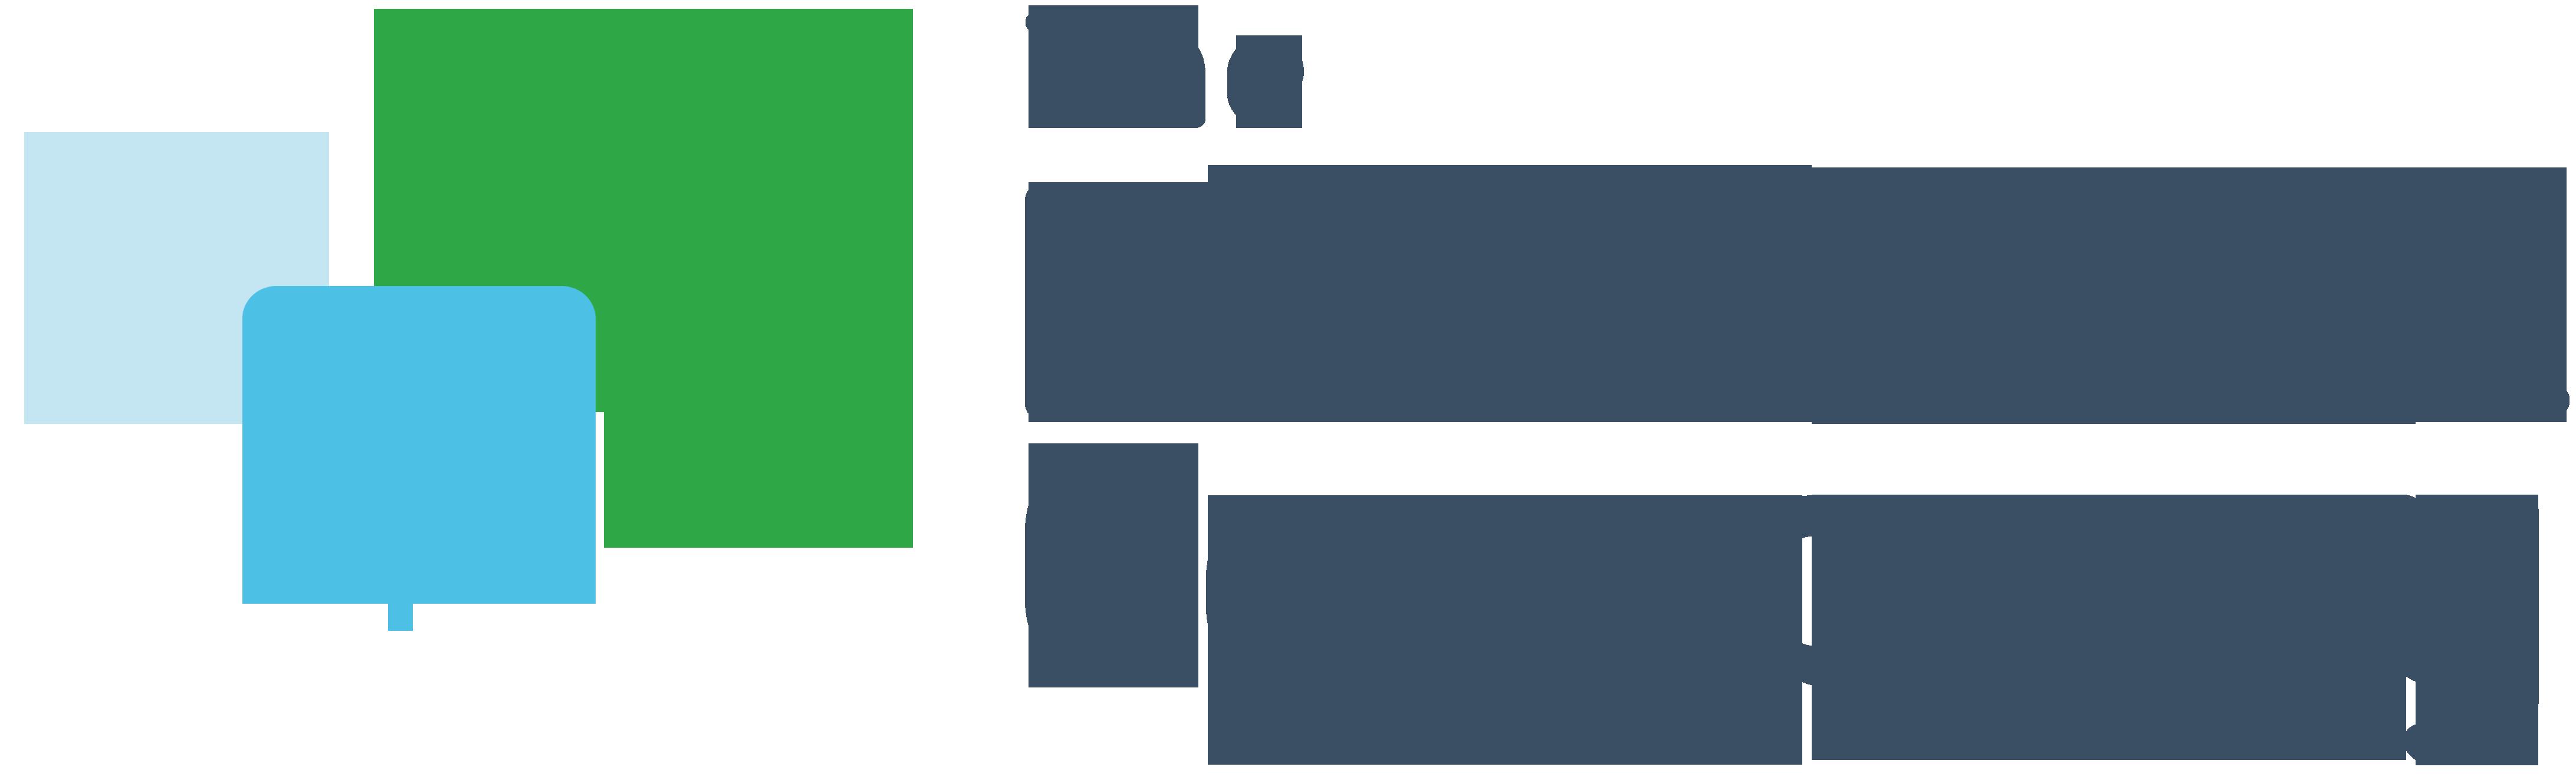 Feedback Company Hoesjescases